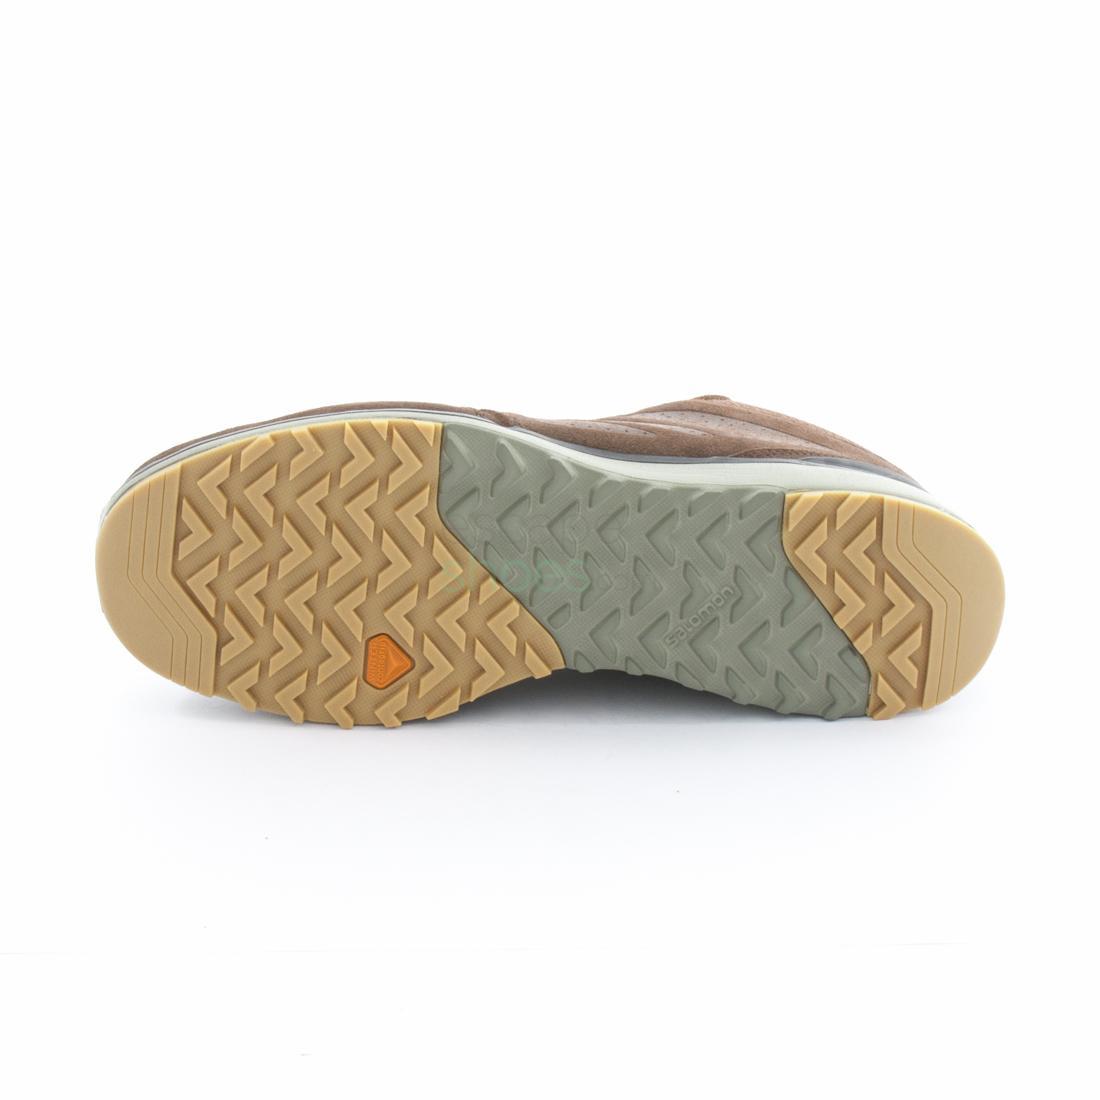 Sneakers SALOMON Utility Chukka Trophy Brown 383092